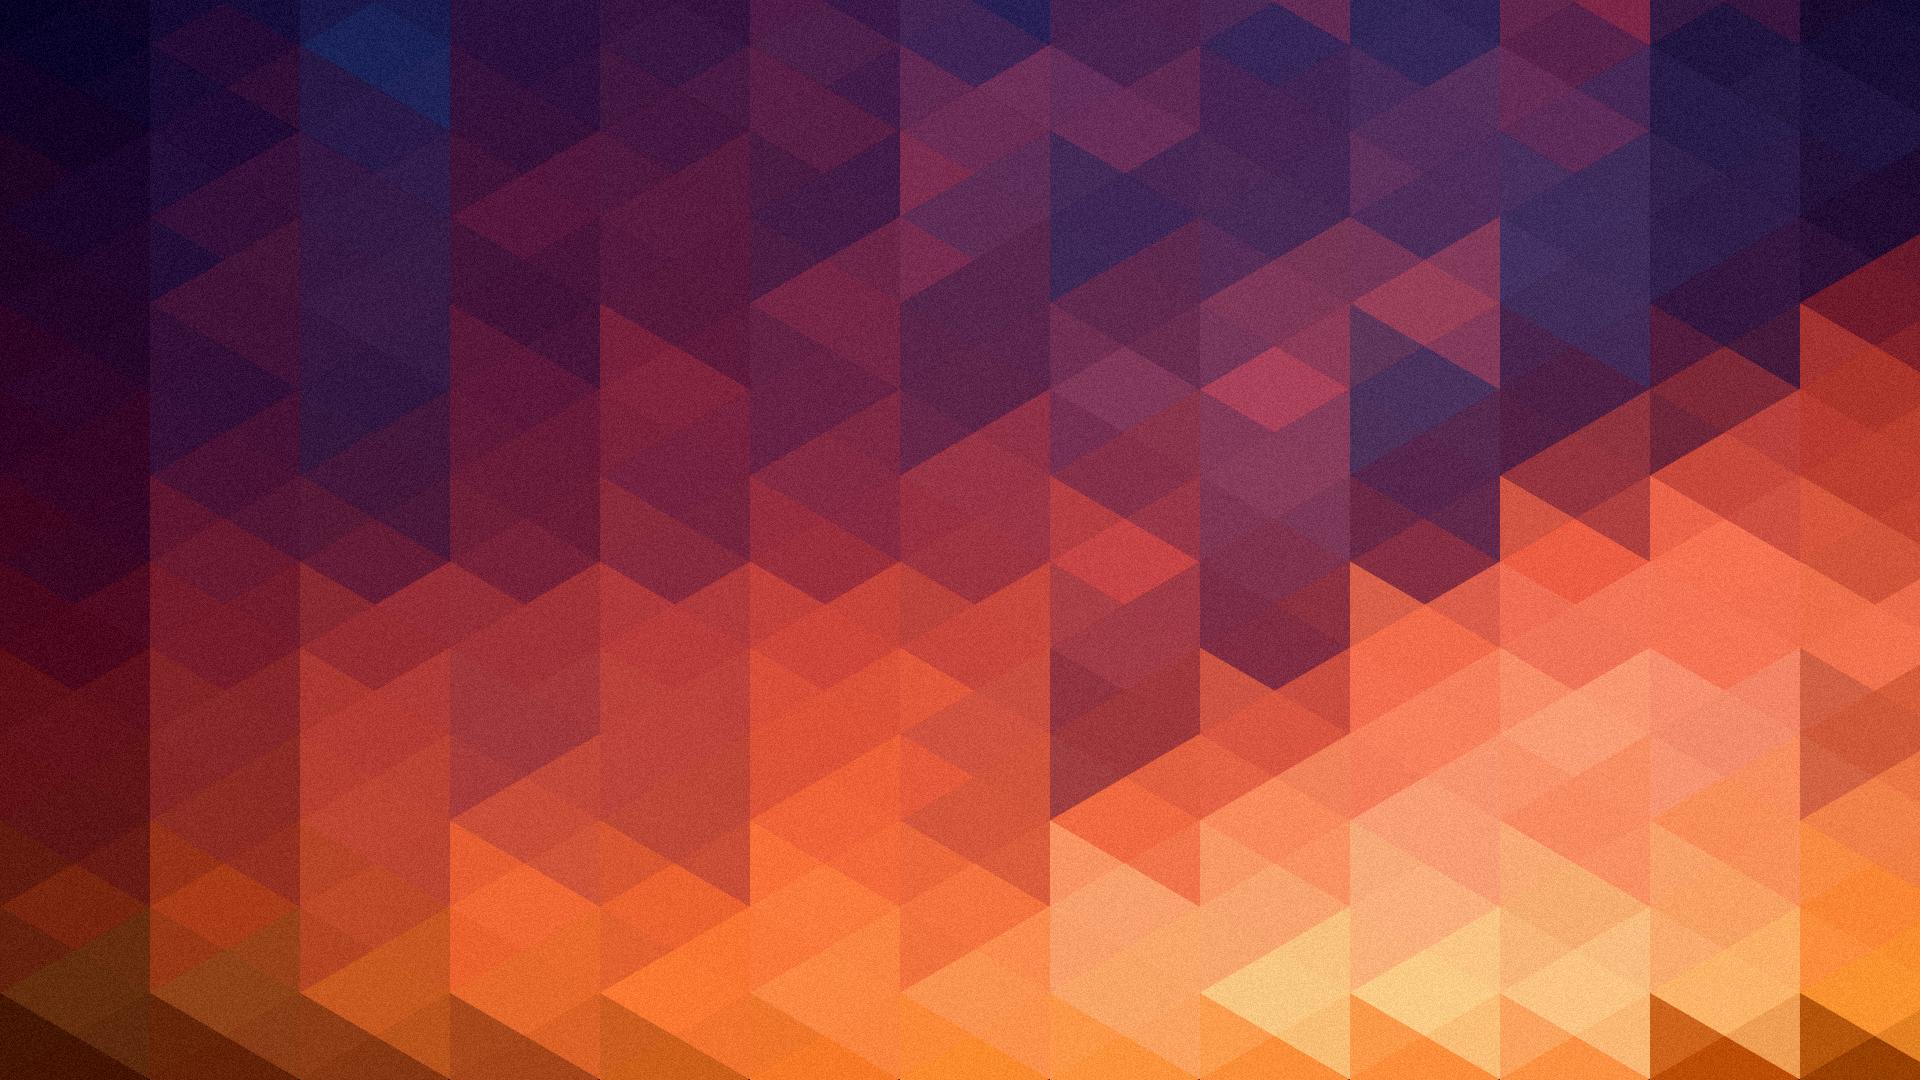 wallpaper-2020049